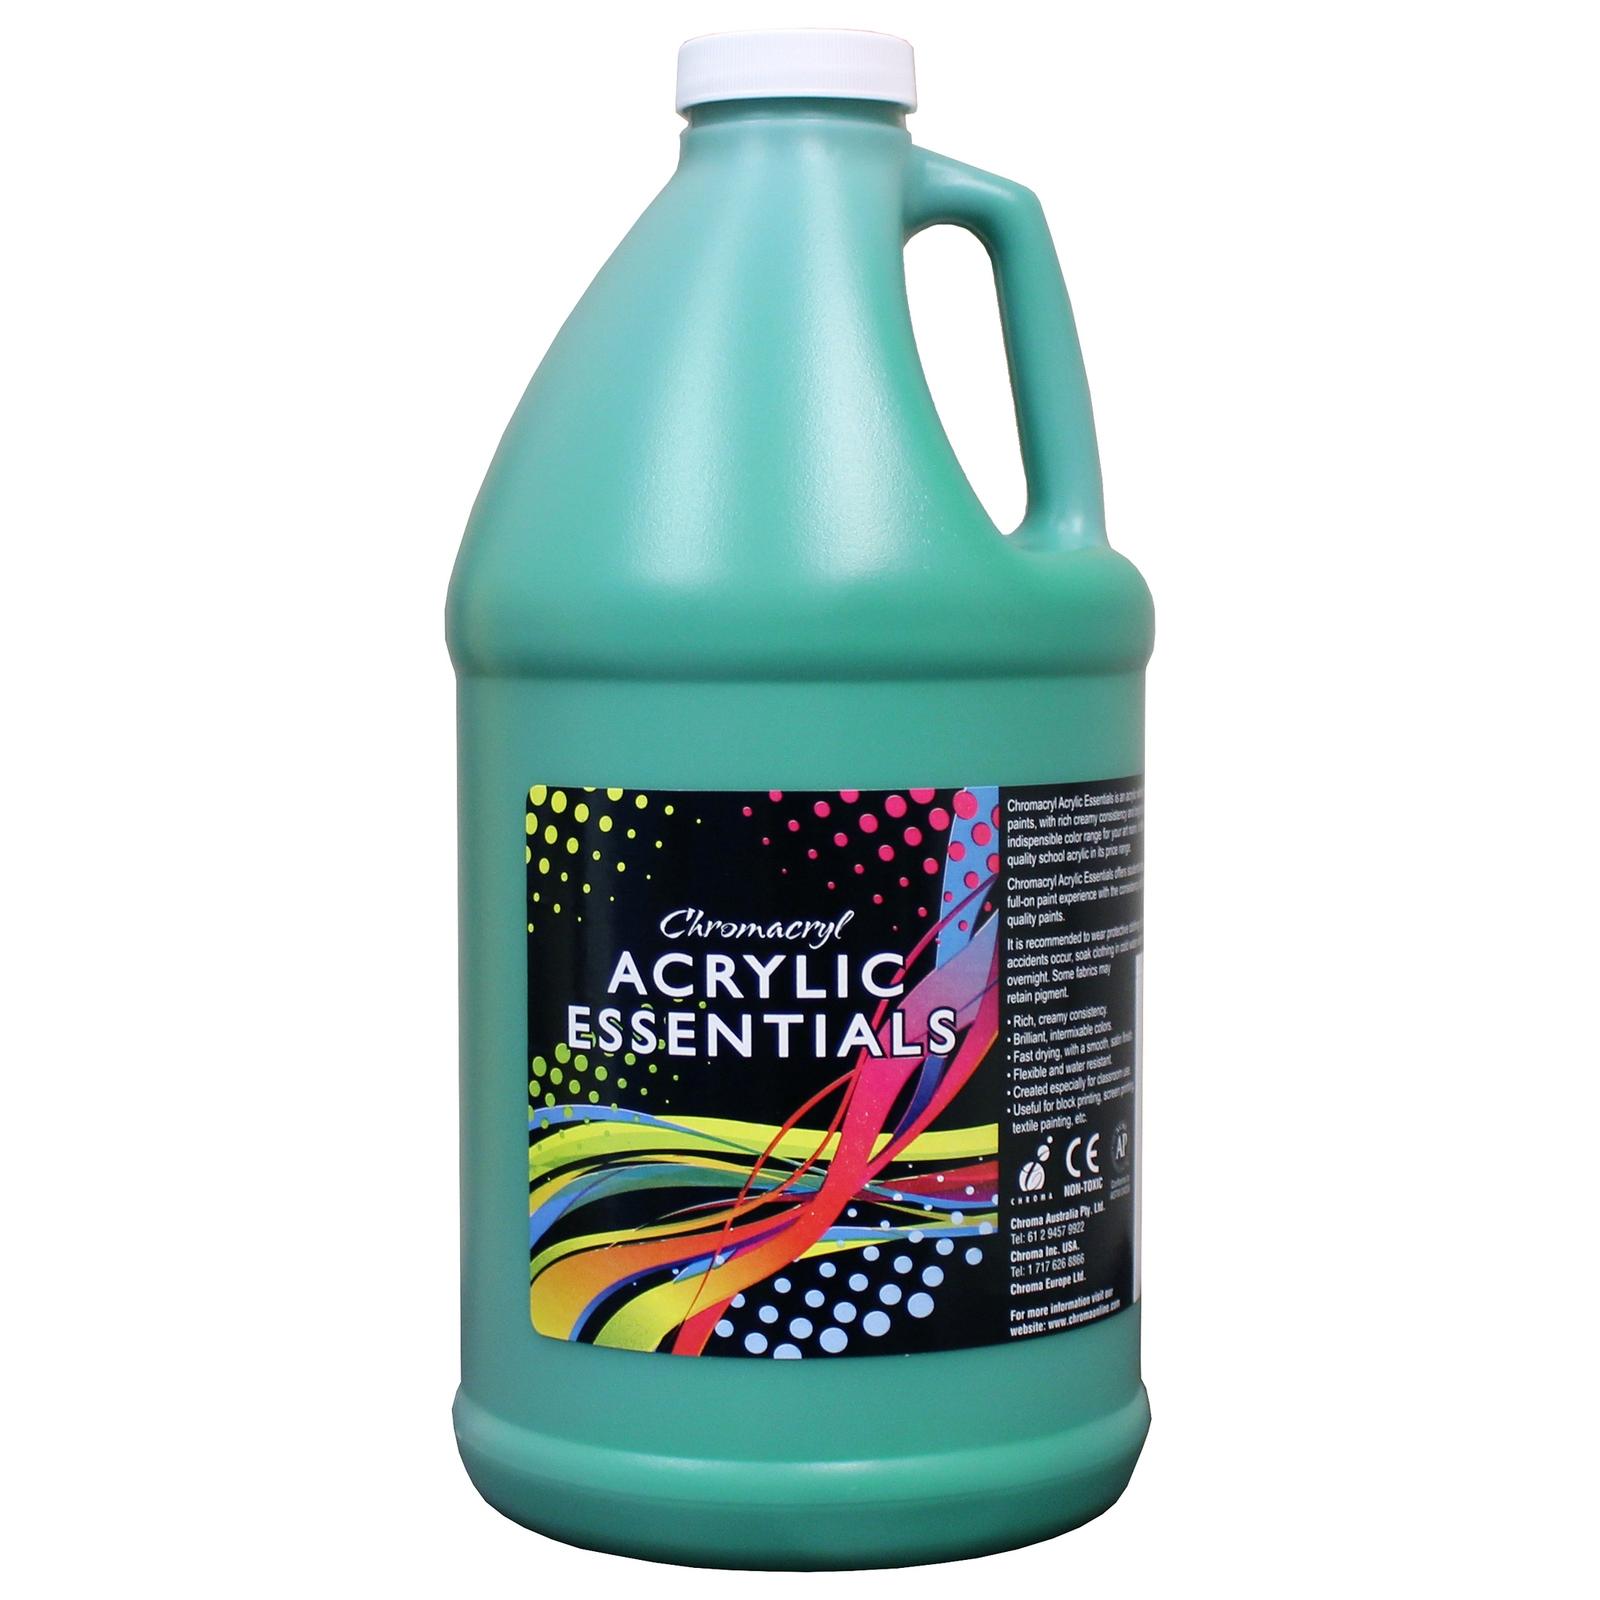 Chromacryl Acrylic Essentials - Green